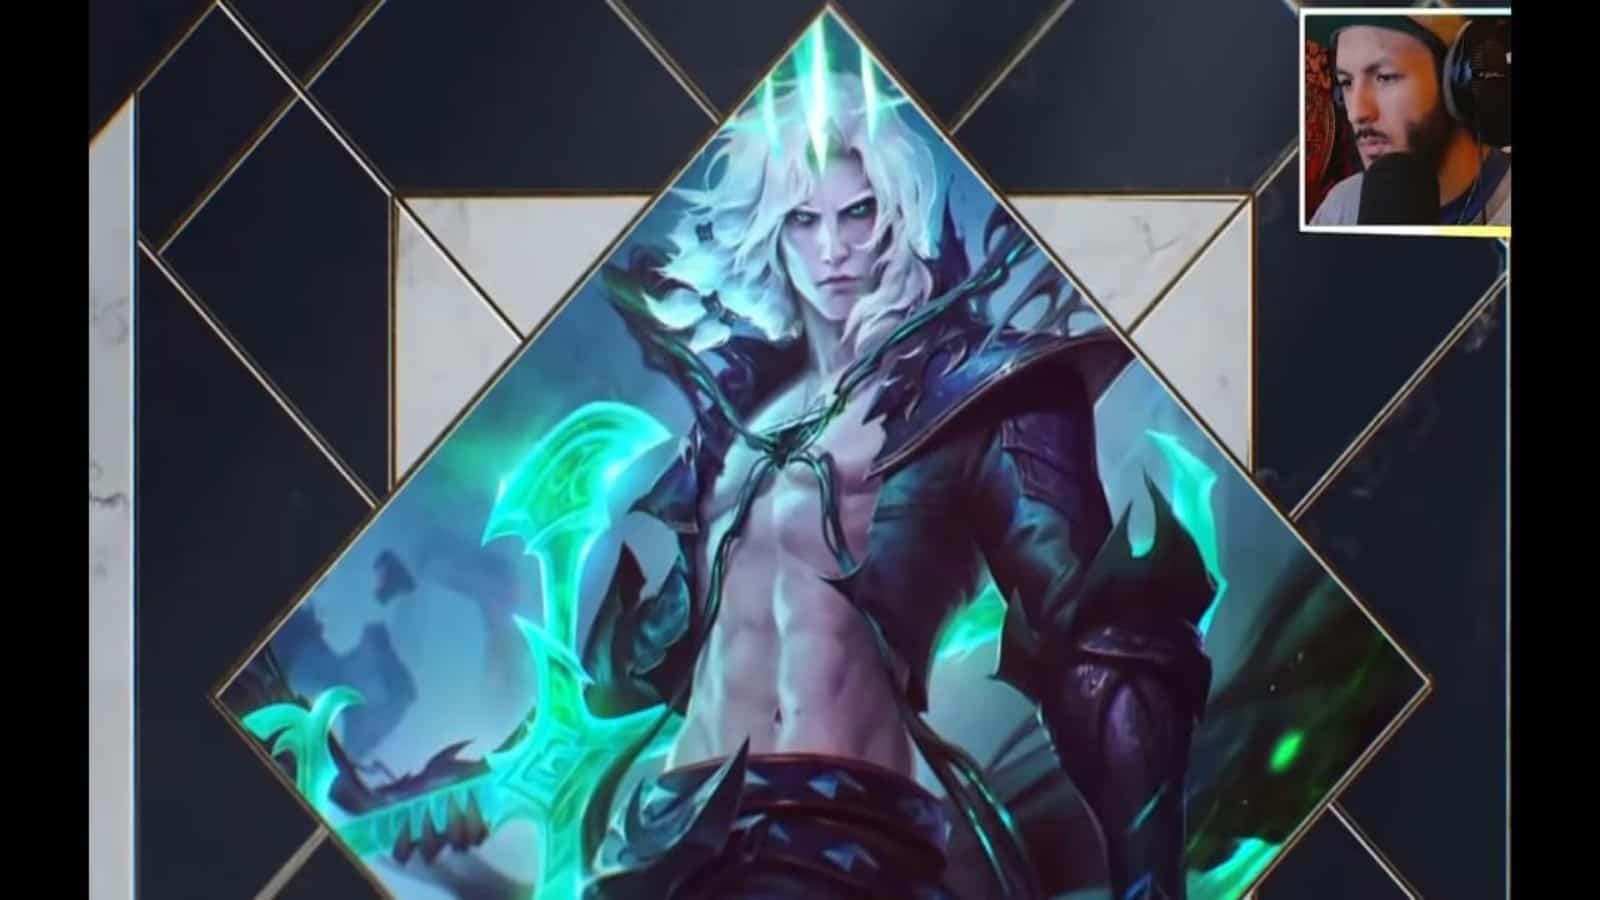 Valorant Sentinels of Light Bundle: New Bundle Hinted Besides Ruination